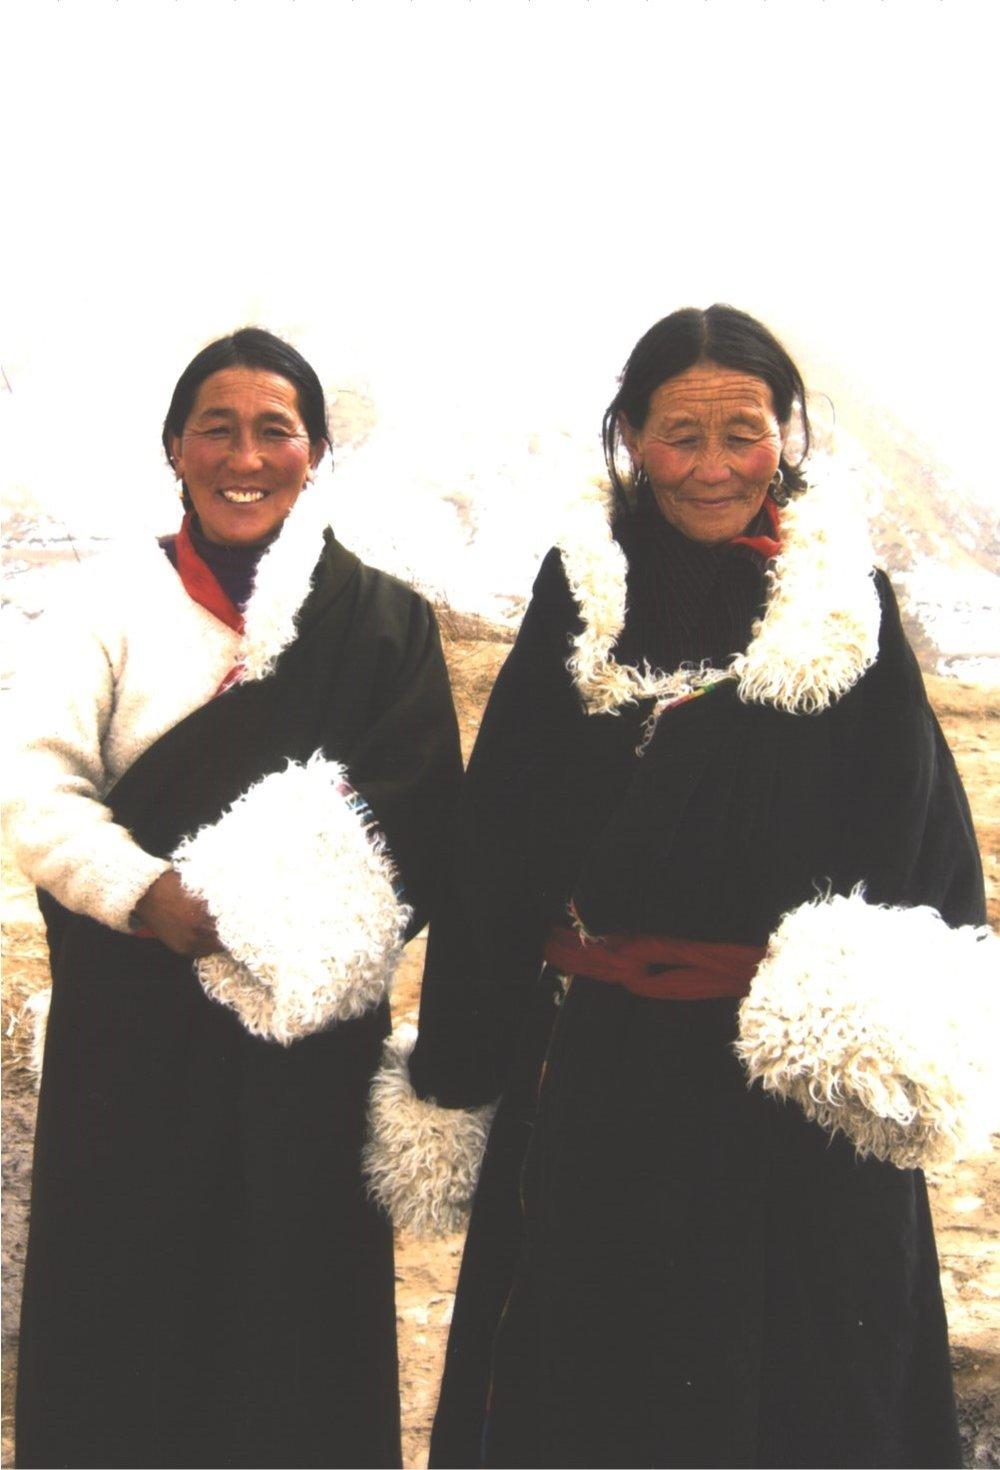 traditionaltibetanwomen.jpg